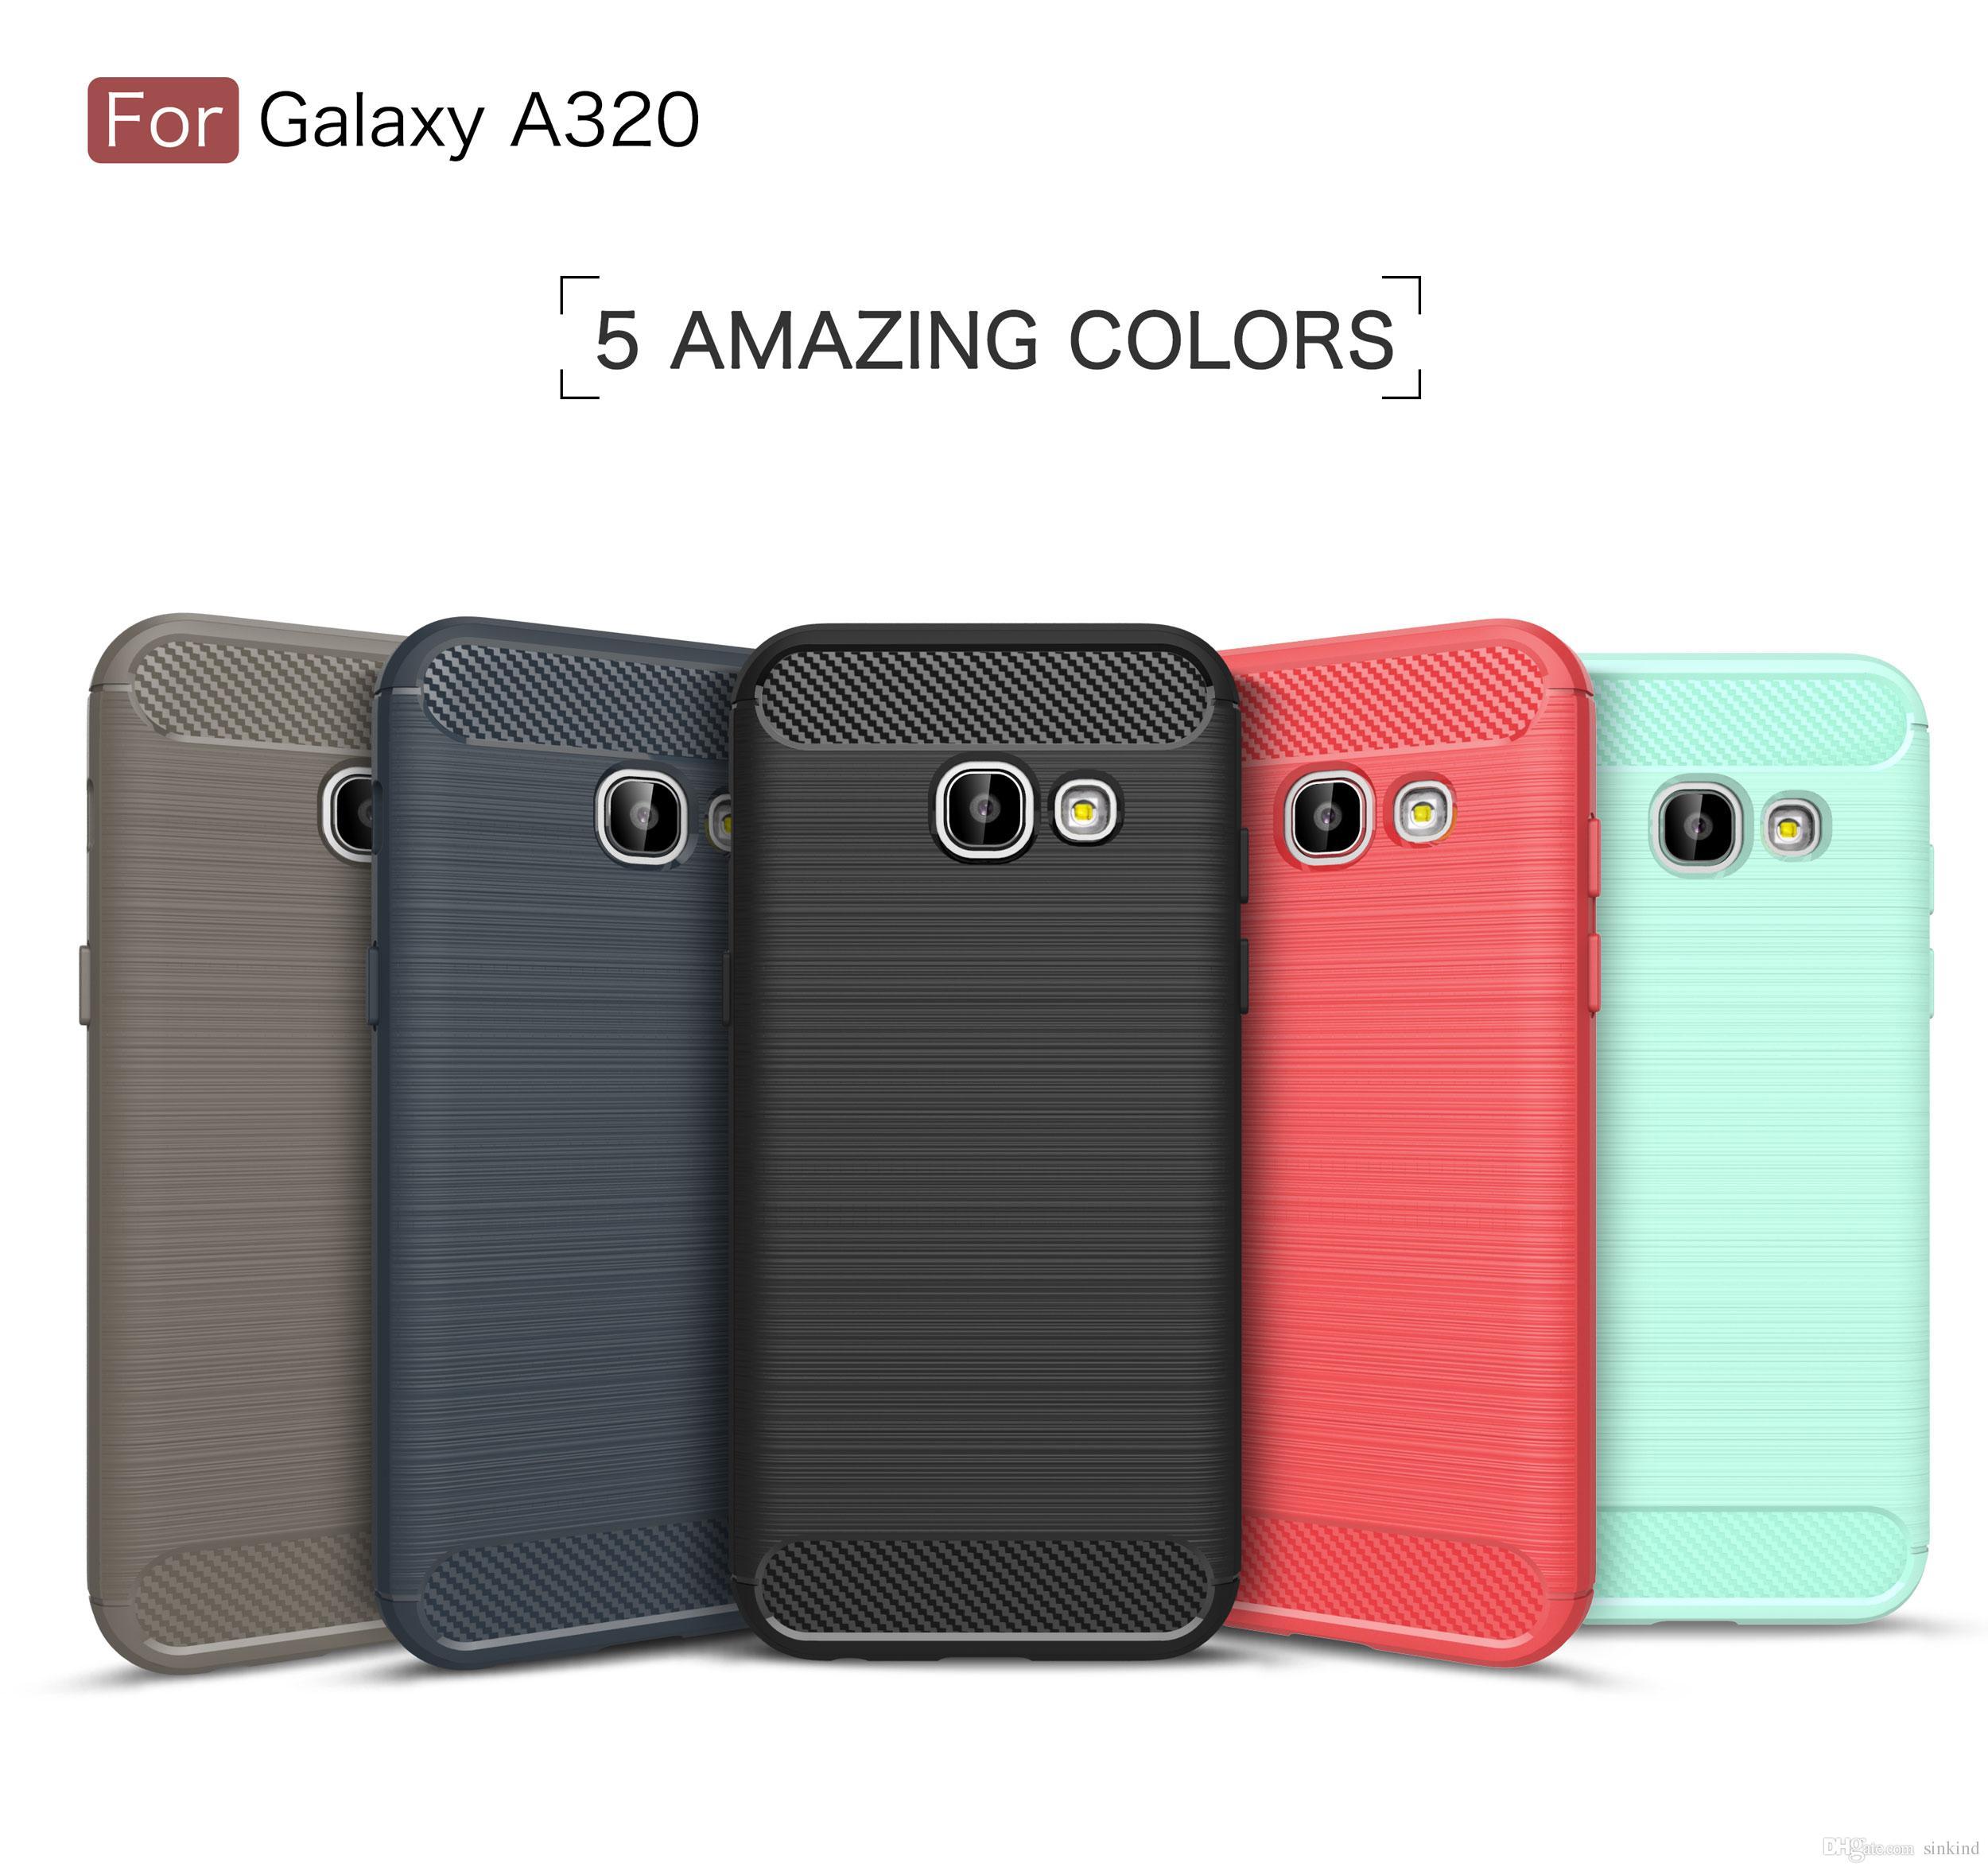 Arktis Handyhüllen Für Samsung Galaxy A3 2017 Fall Tpu Abdeckung Silikon Kohlefaser Vollabdeckung Für Galaxy A3 2017 A320 Fall Handyhüllen Individuell Von